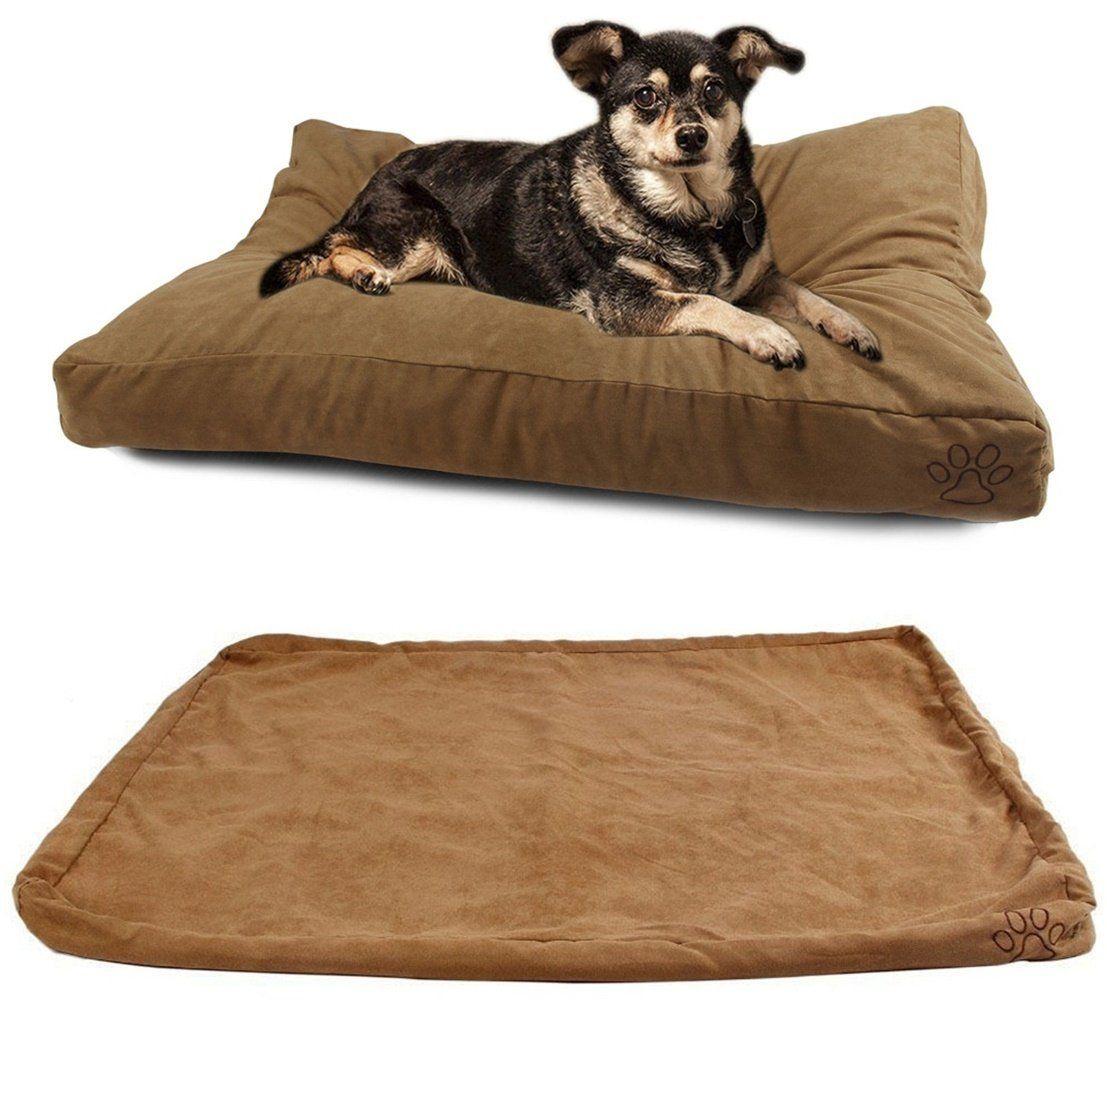 1Pcs Grandiose Popular Pet Bed Cover Size L 36' x 29' Zipper Dog Comfort Replacement Color Type Khaki Suede ** Visit the image link more details.